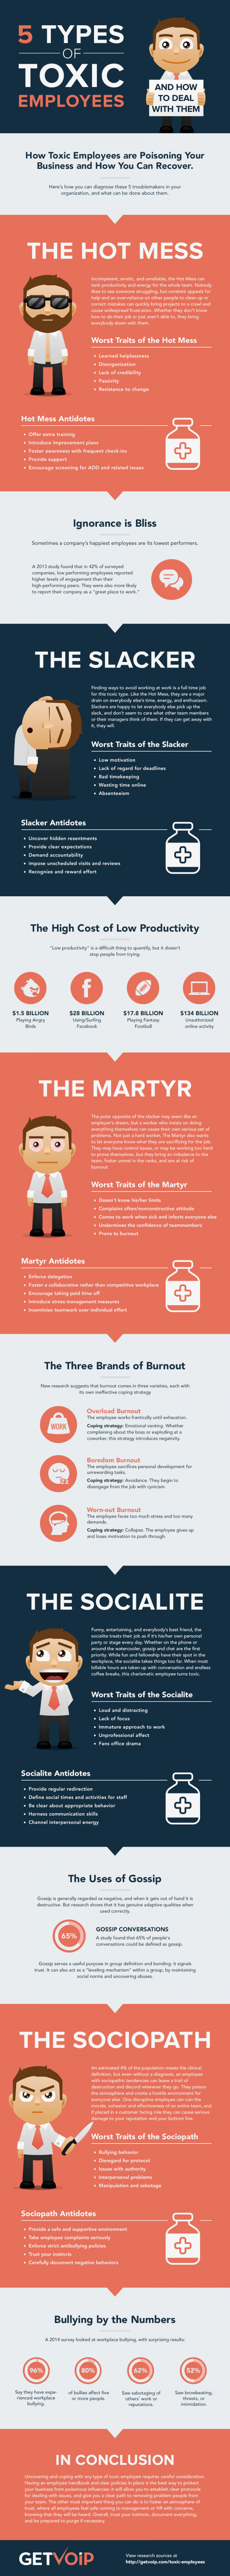 toxic-employees-infographic